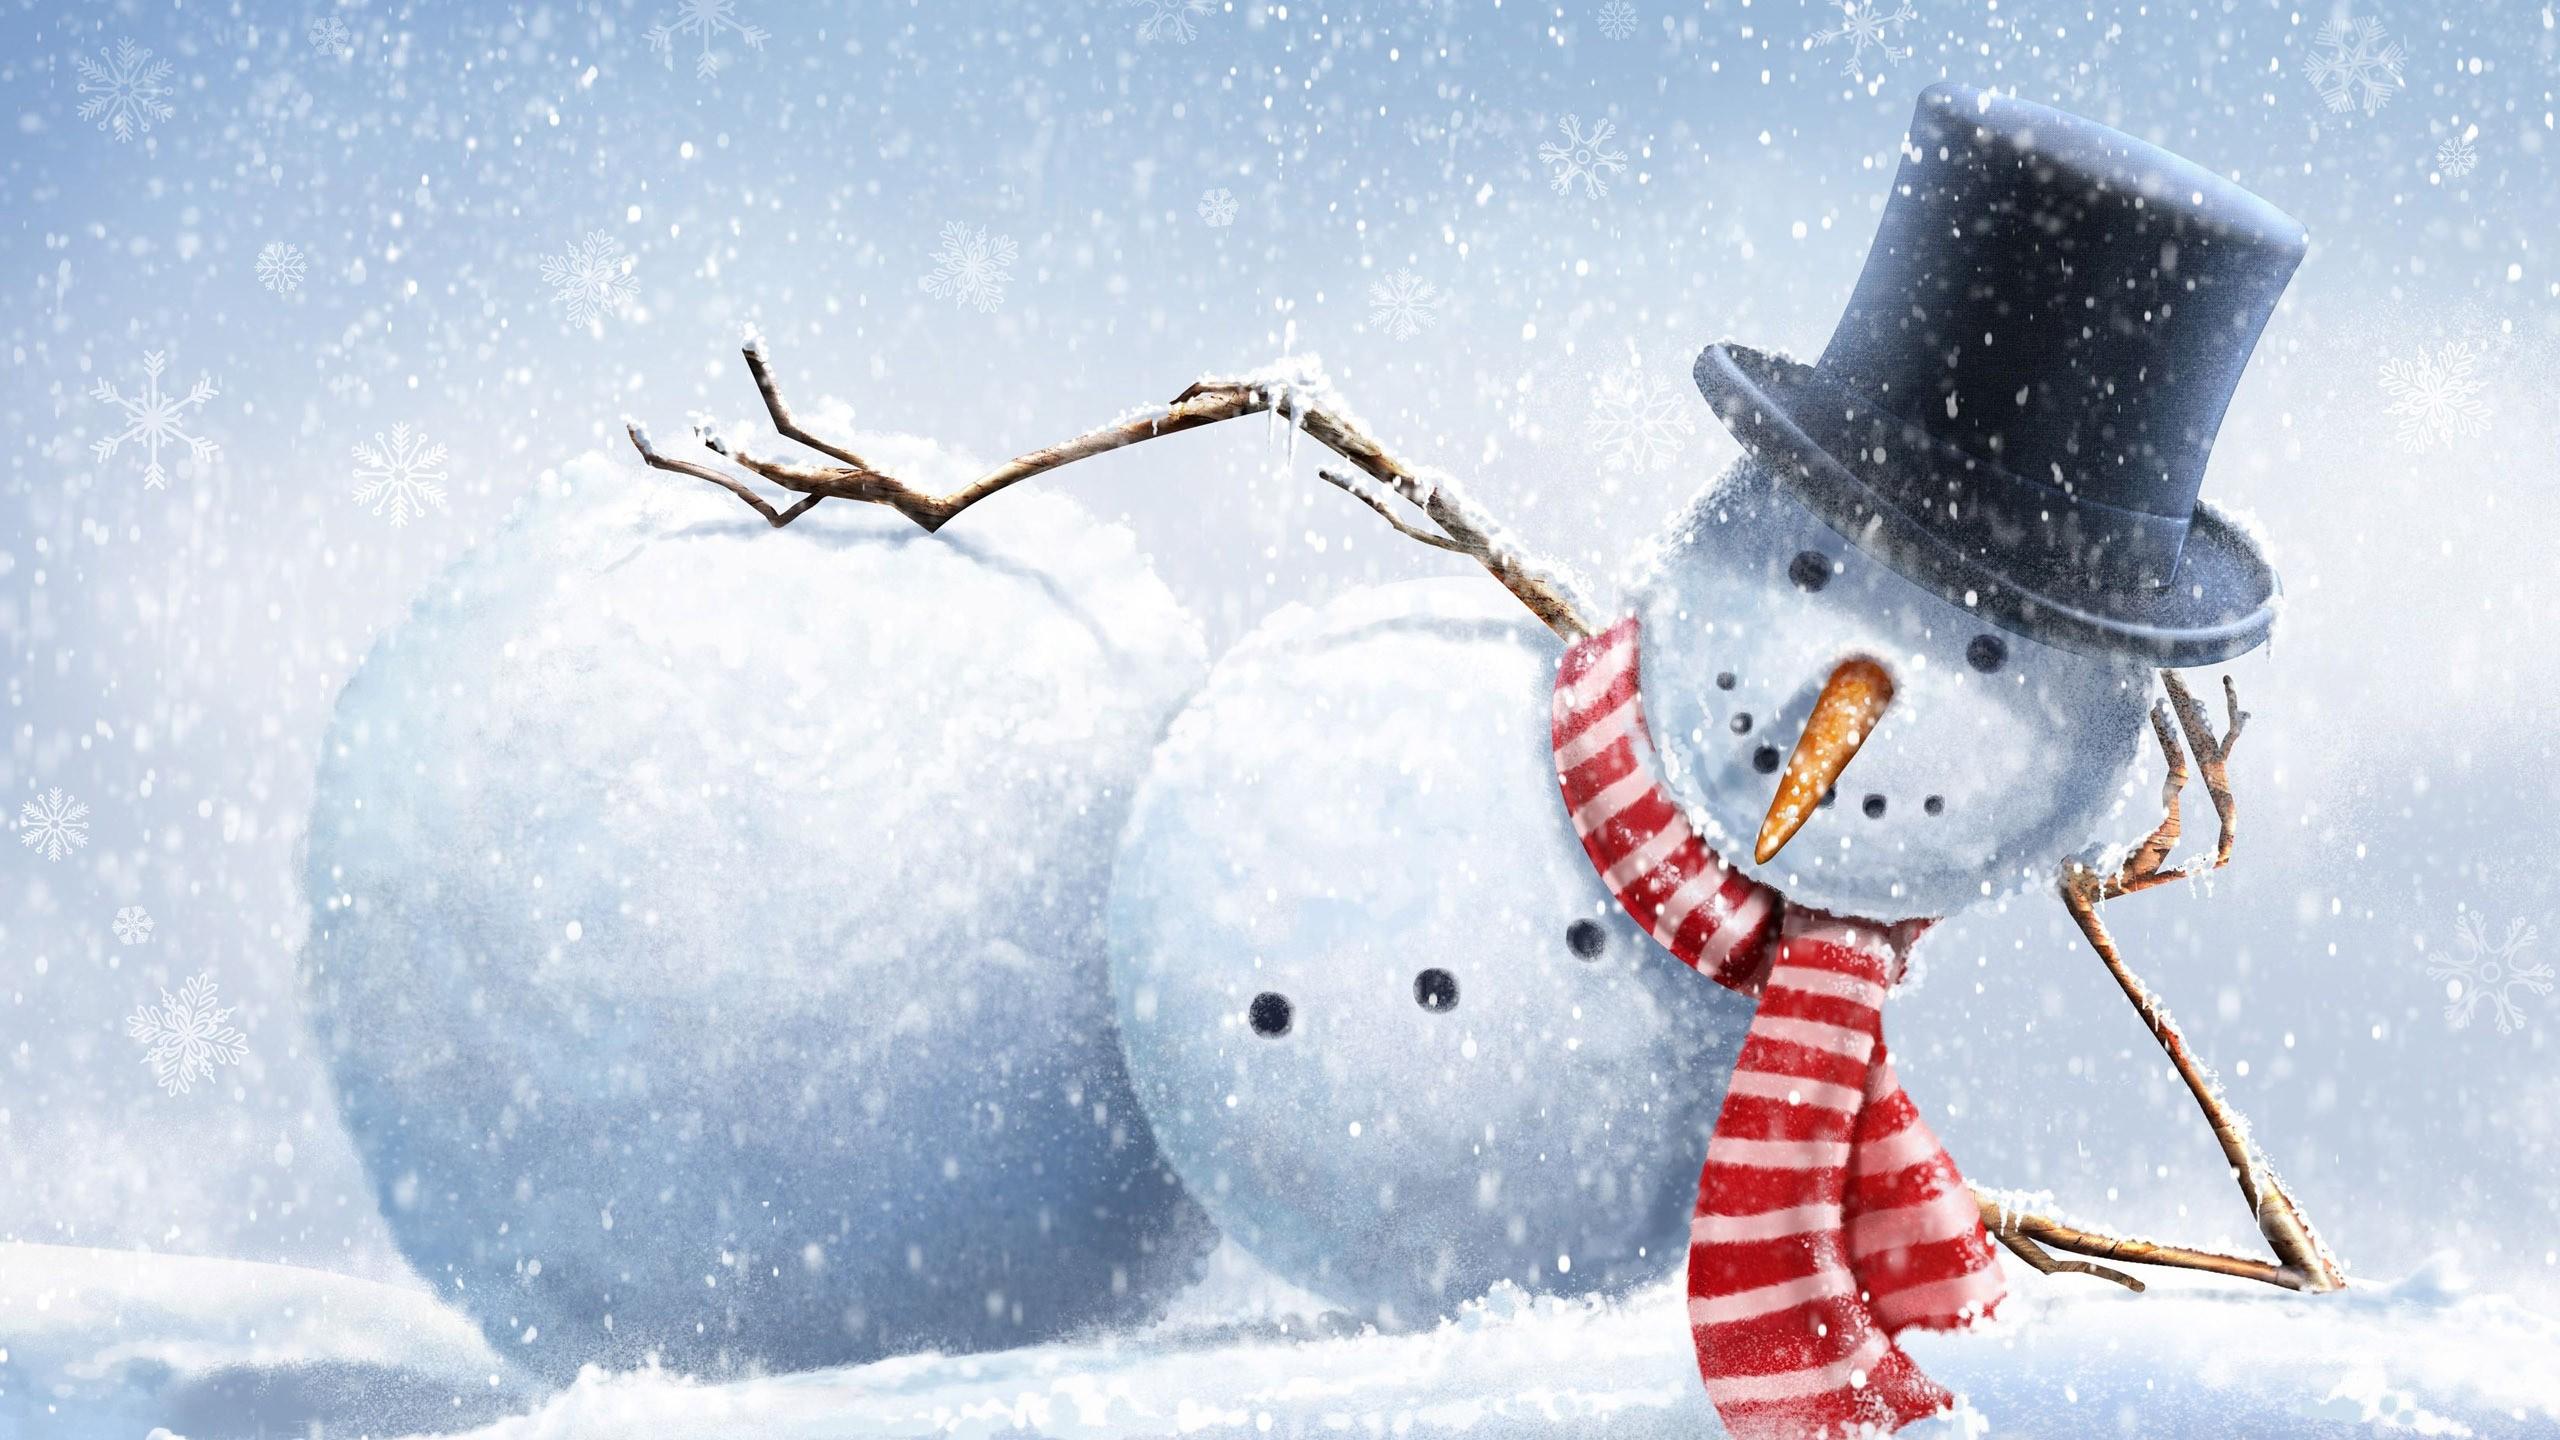 Drawn wallpaper winter Branch snowman winter snowman carrots